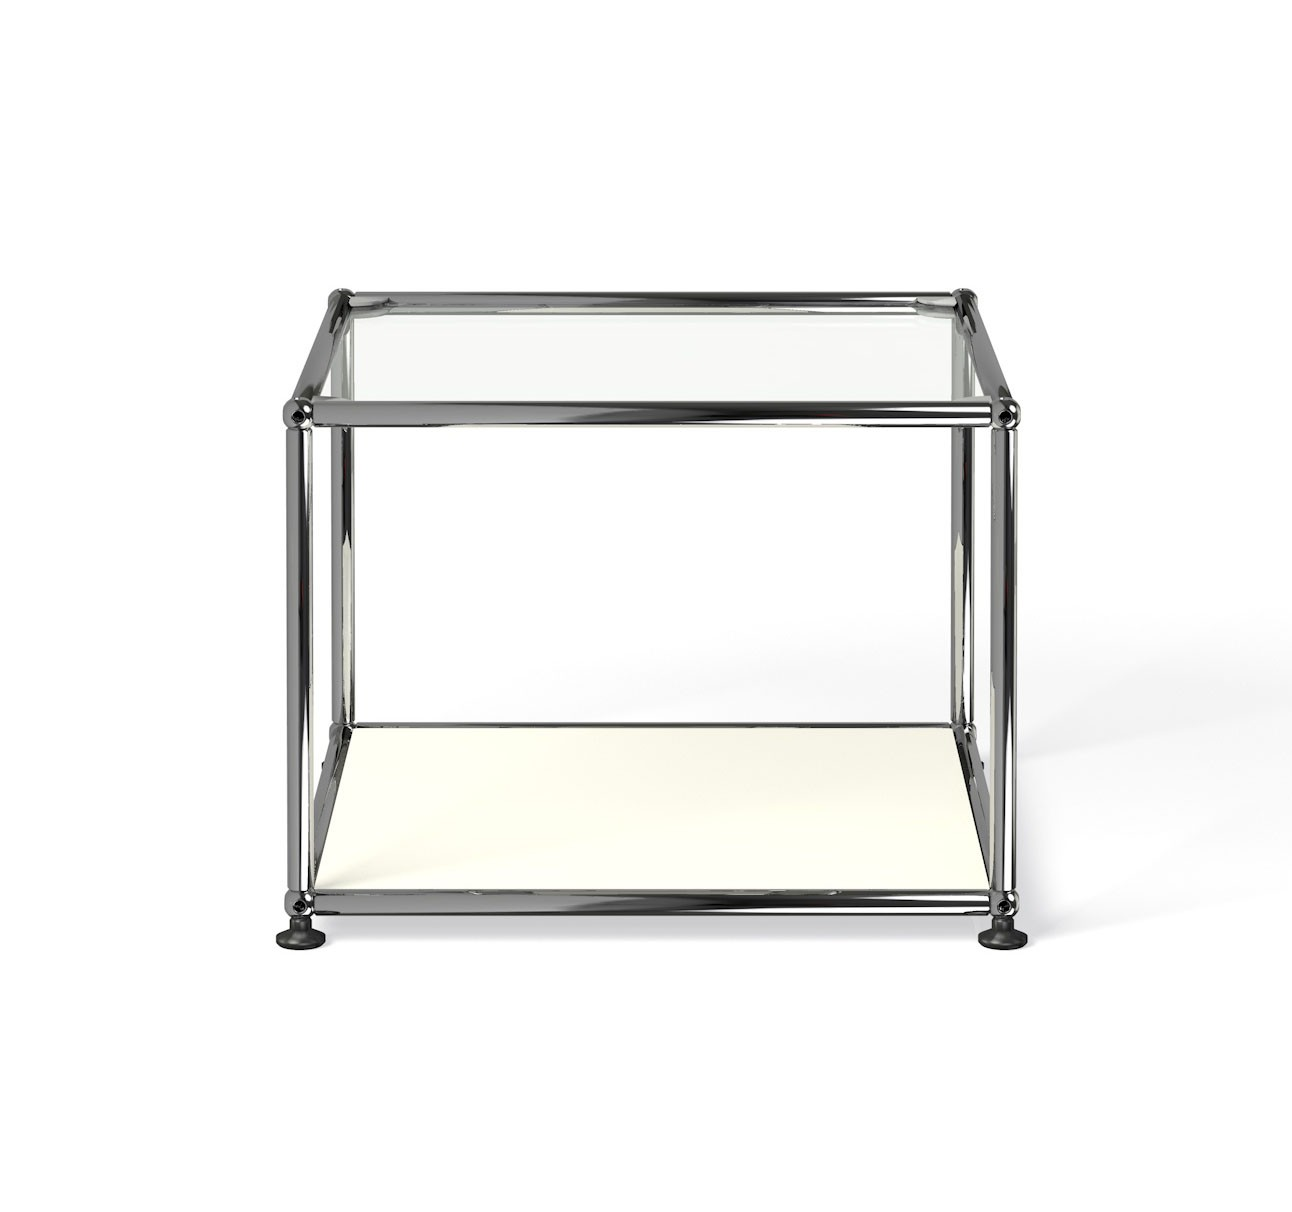 Petite Table Basse Carree Usm Haller M17 5 Coloris